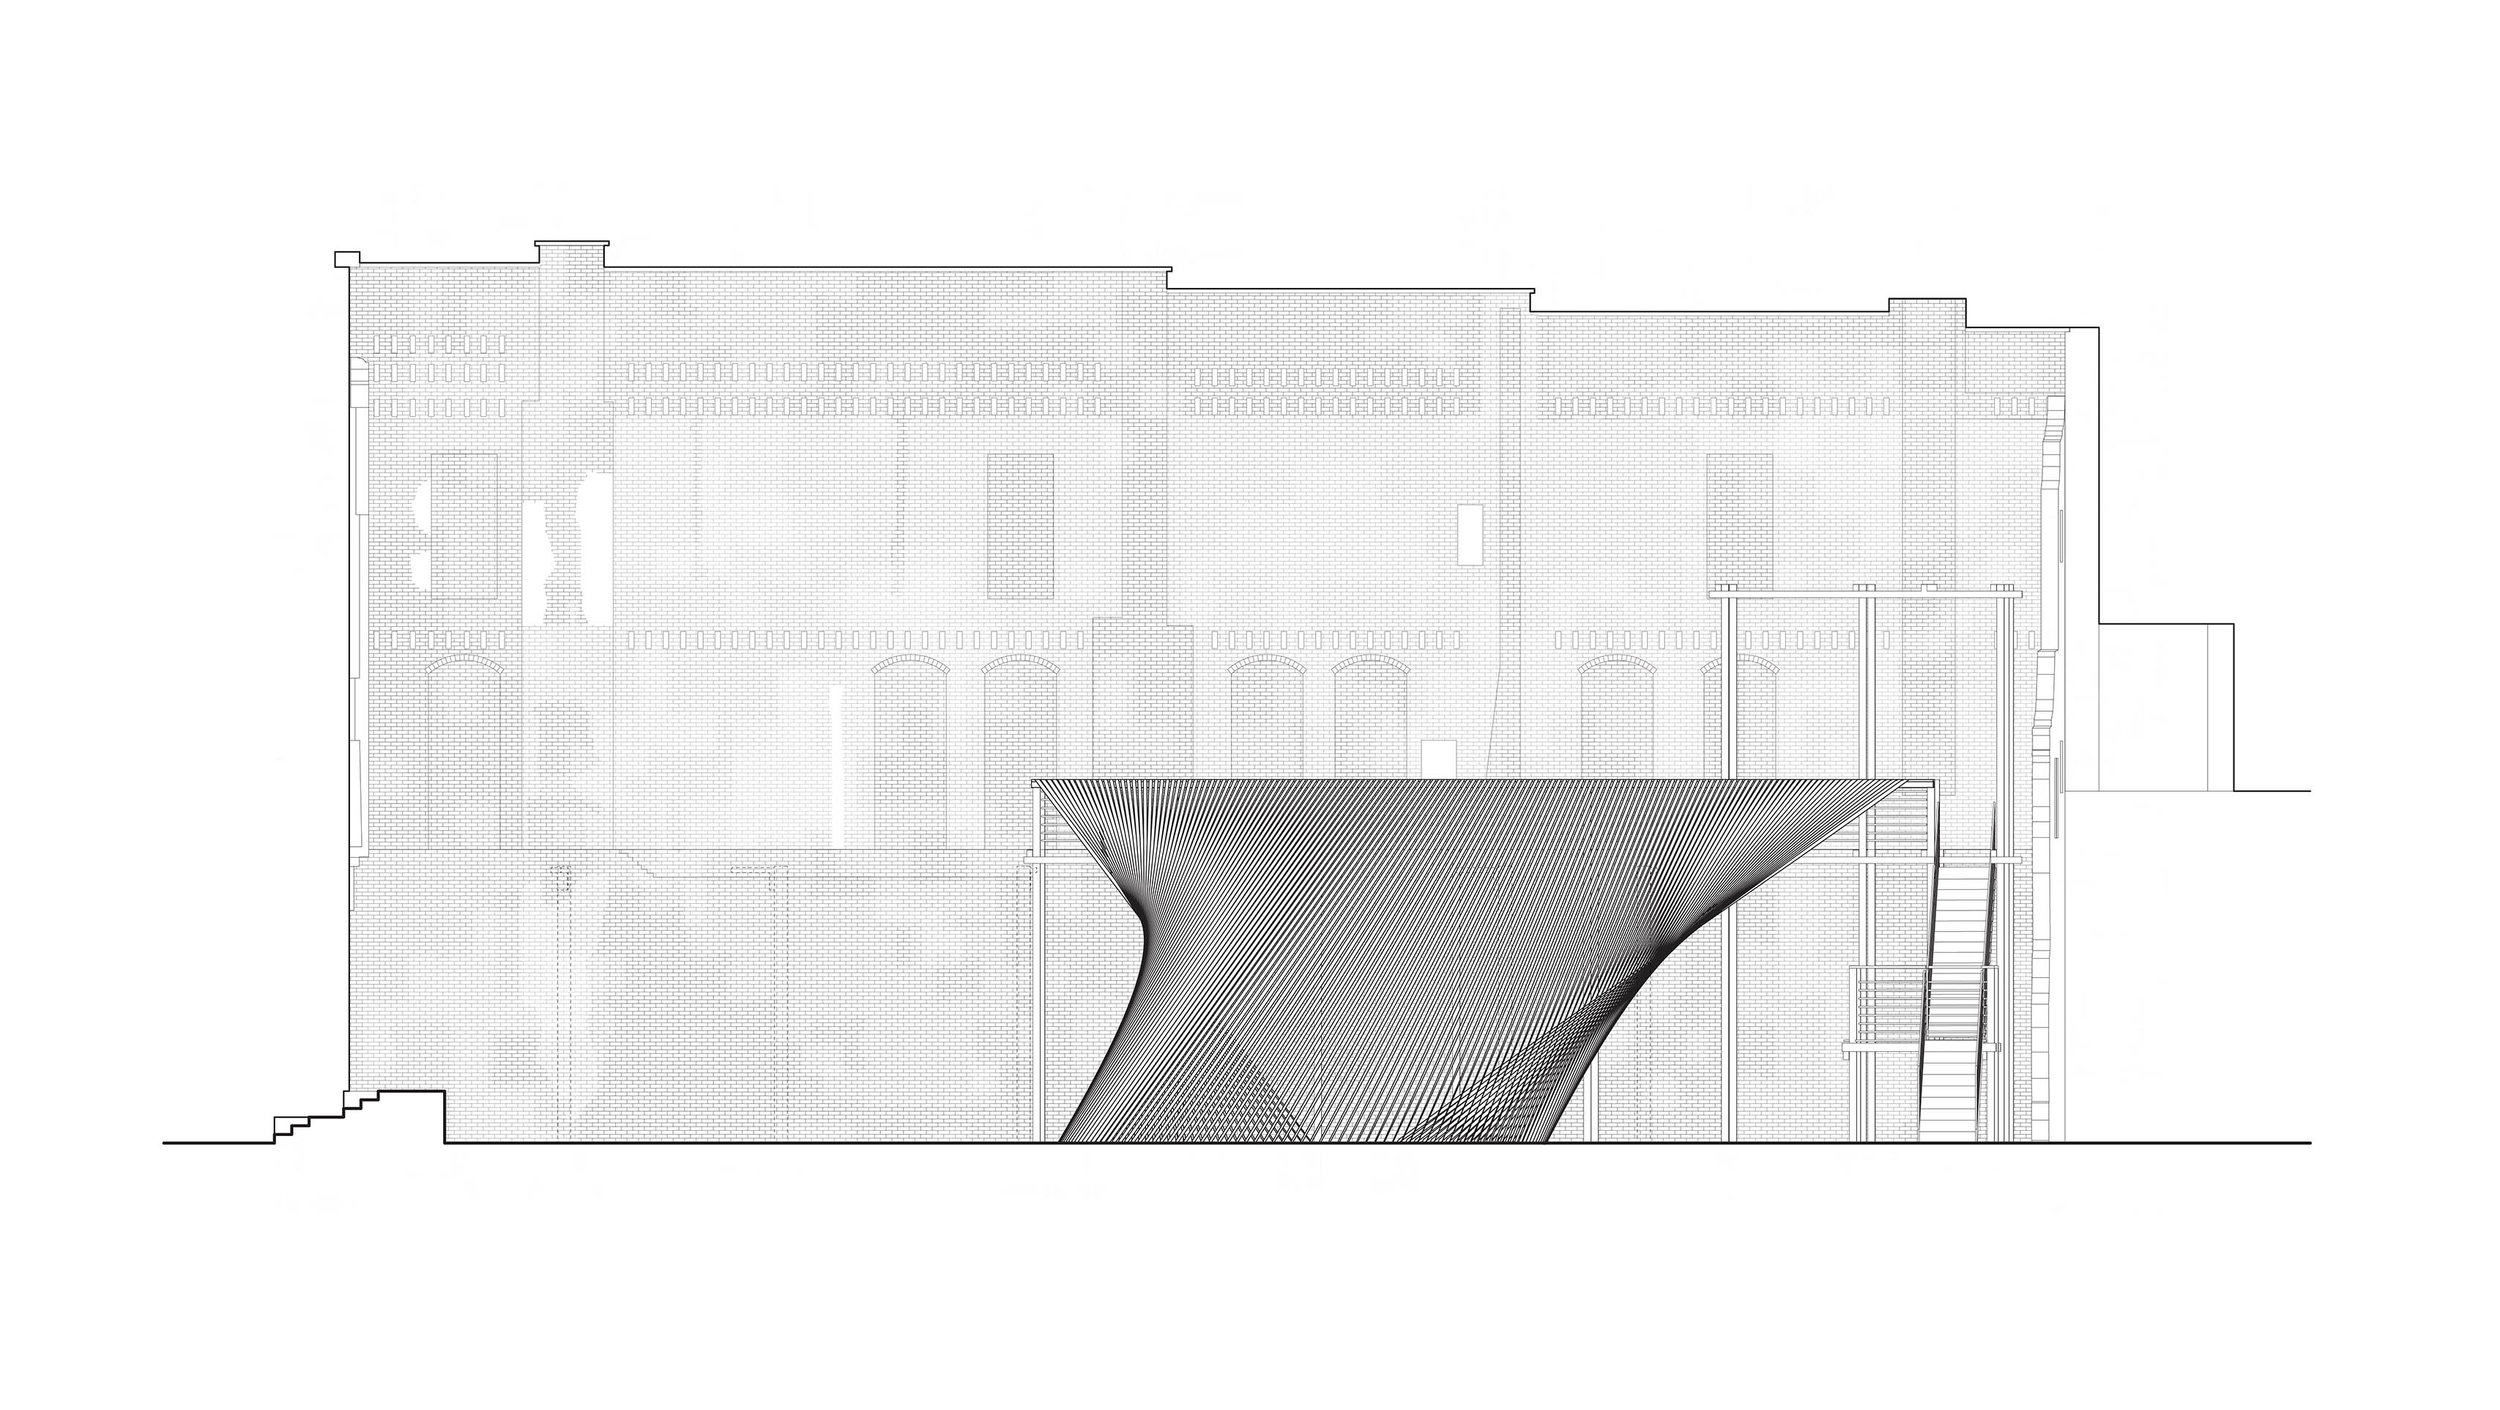 Coshocton - Elevation.jpg